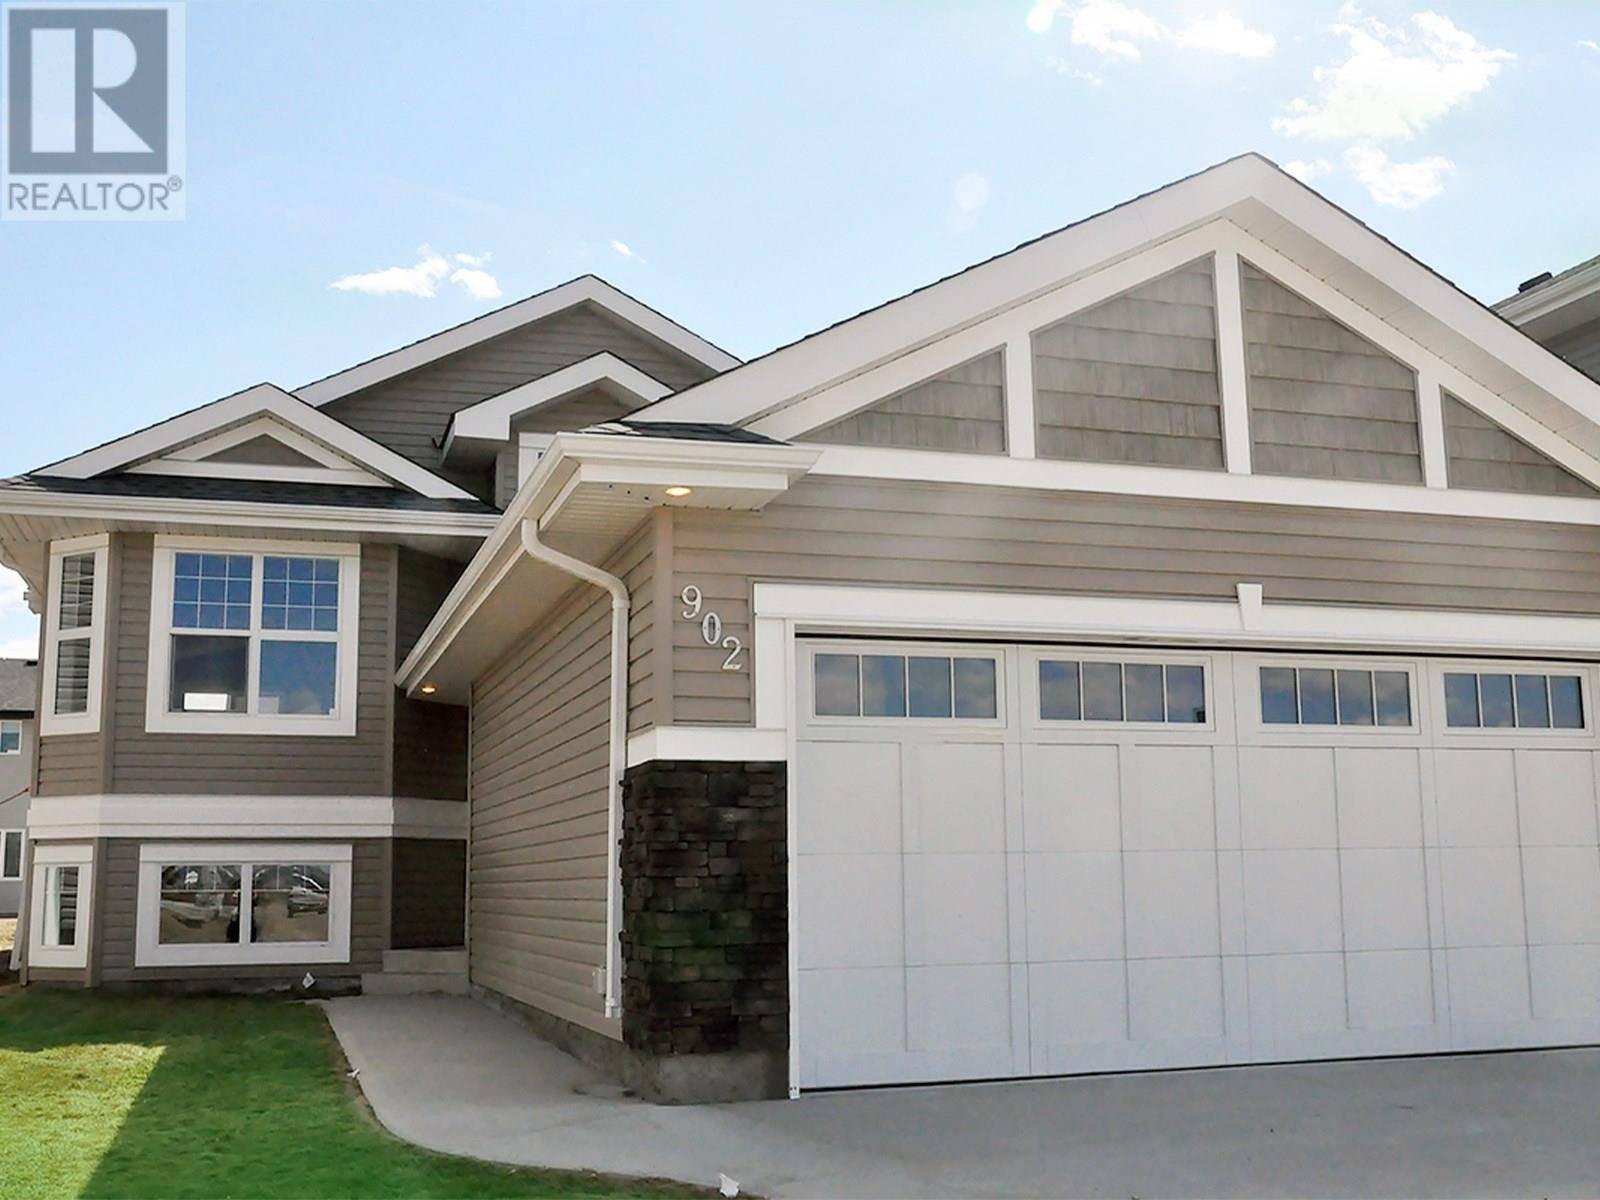 House for sale at 902 Childers Ct Saskatoon Saskatchewan - MLS: SK783115